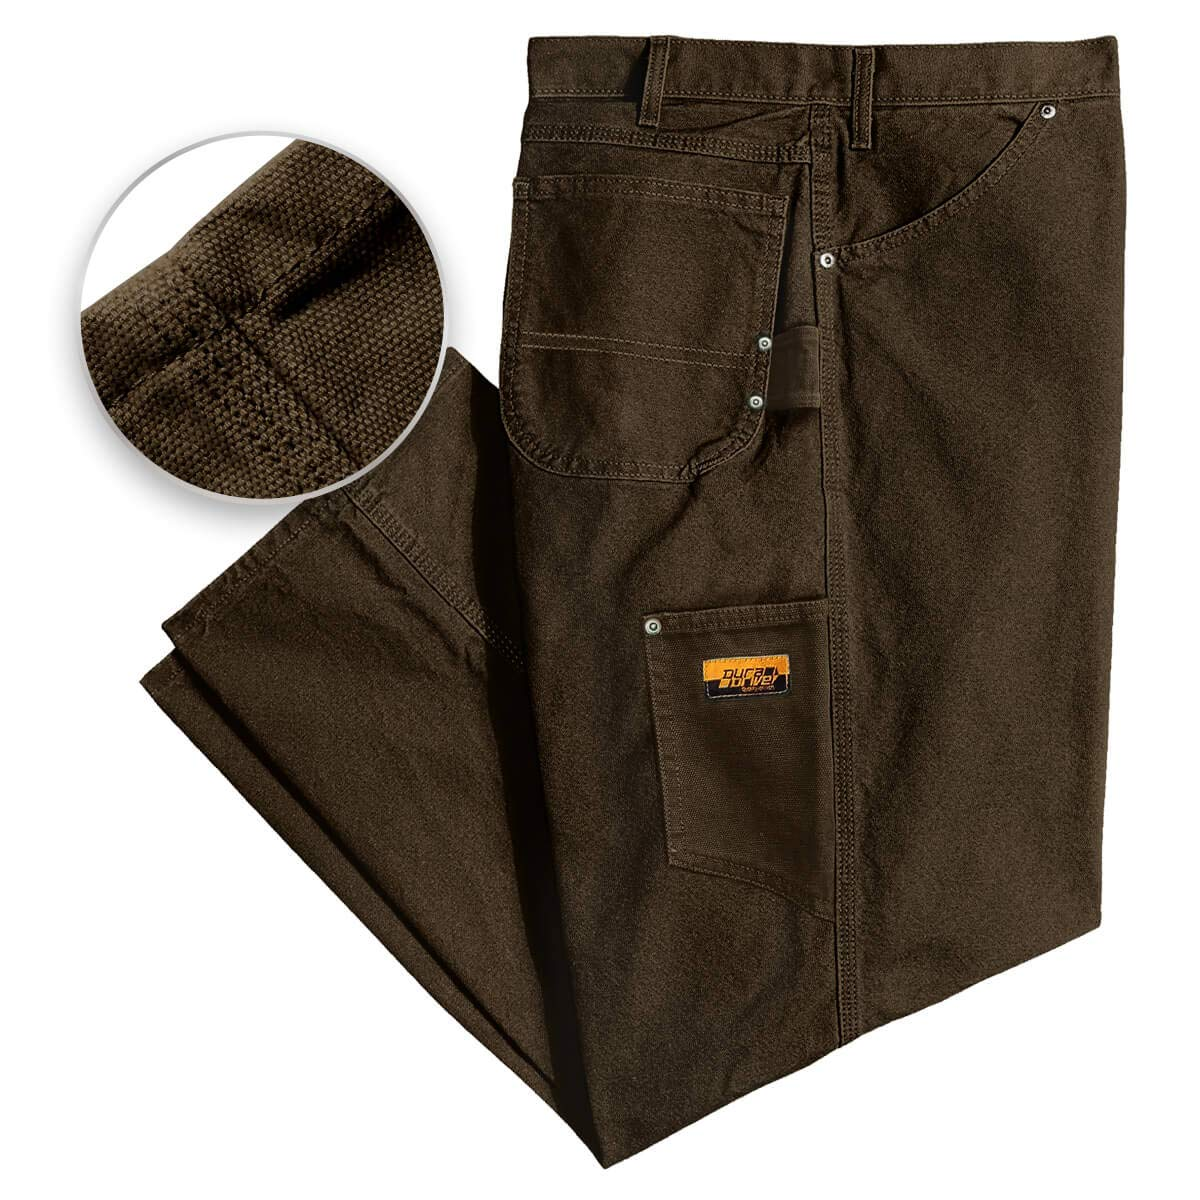 DuraDrive 34W x 34L Black Mens Loose Fit Garment Washed Duck Canvas Work Dungaree Carpenter Pants